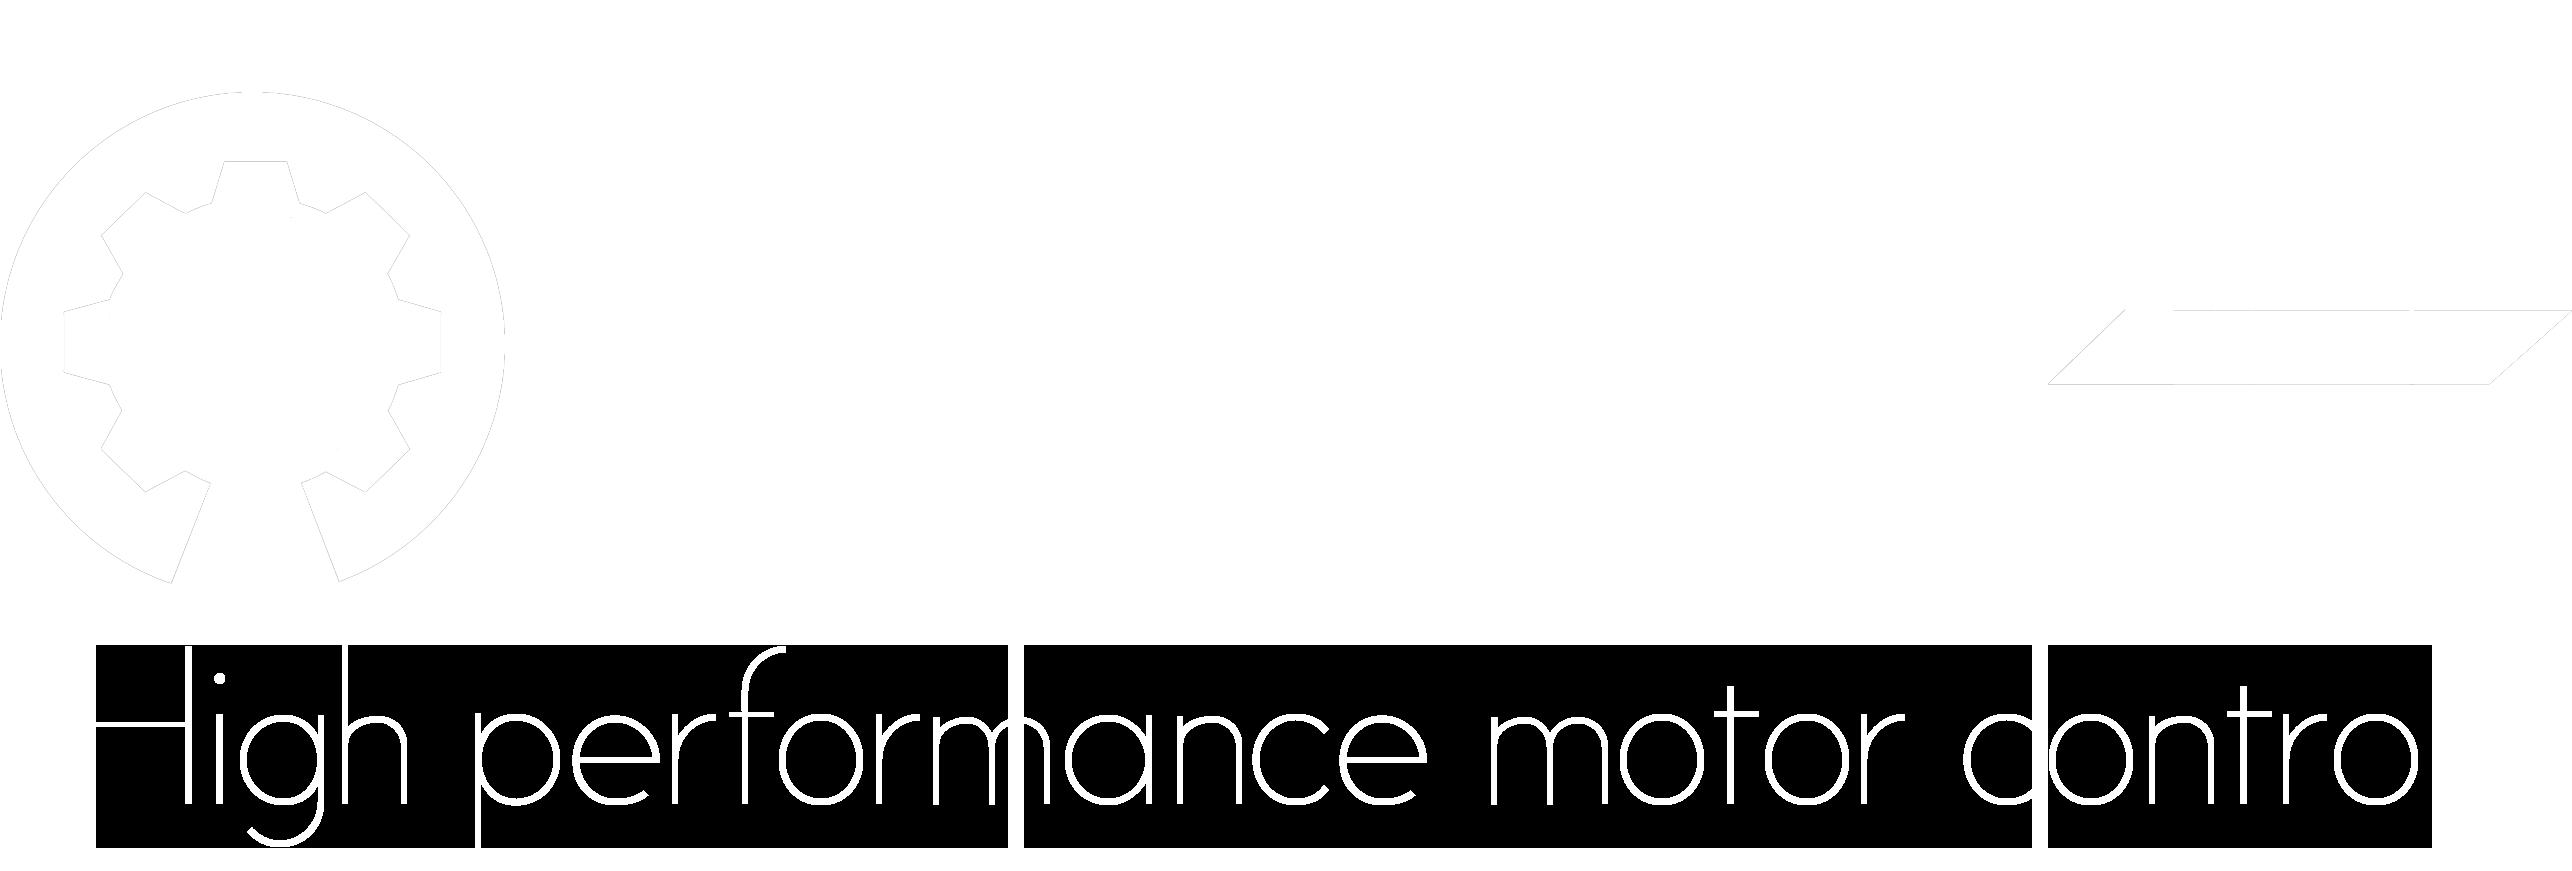 ODrive Community